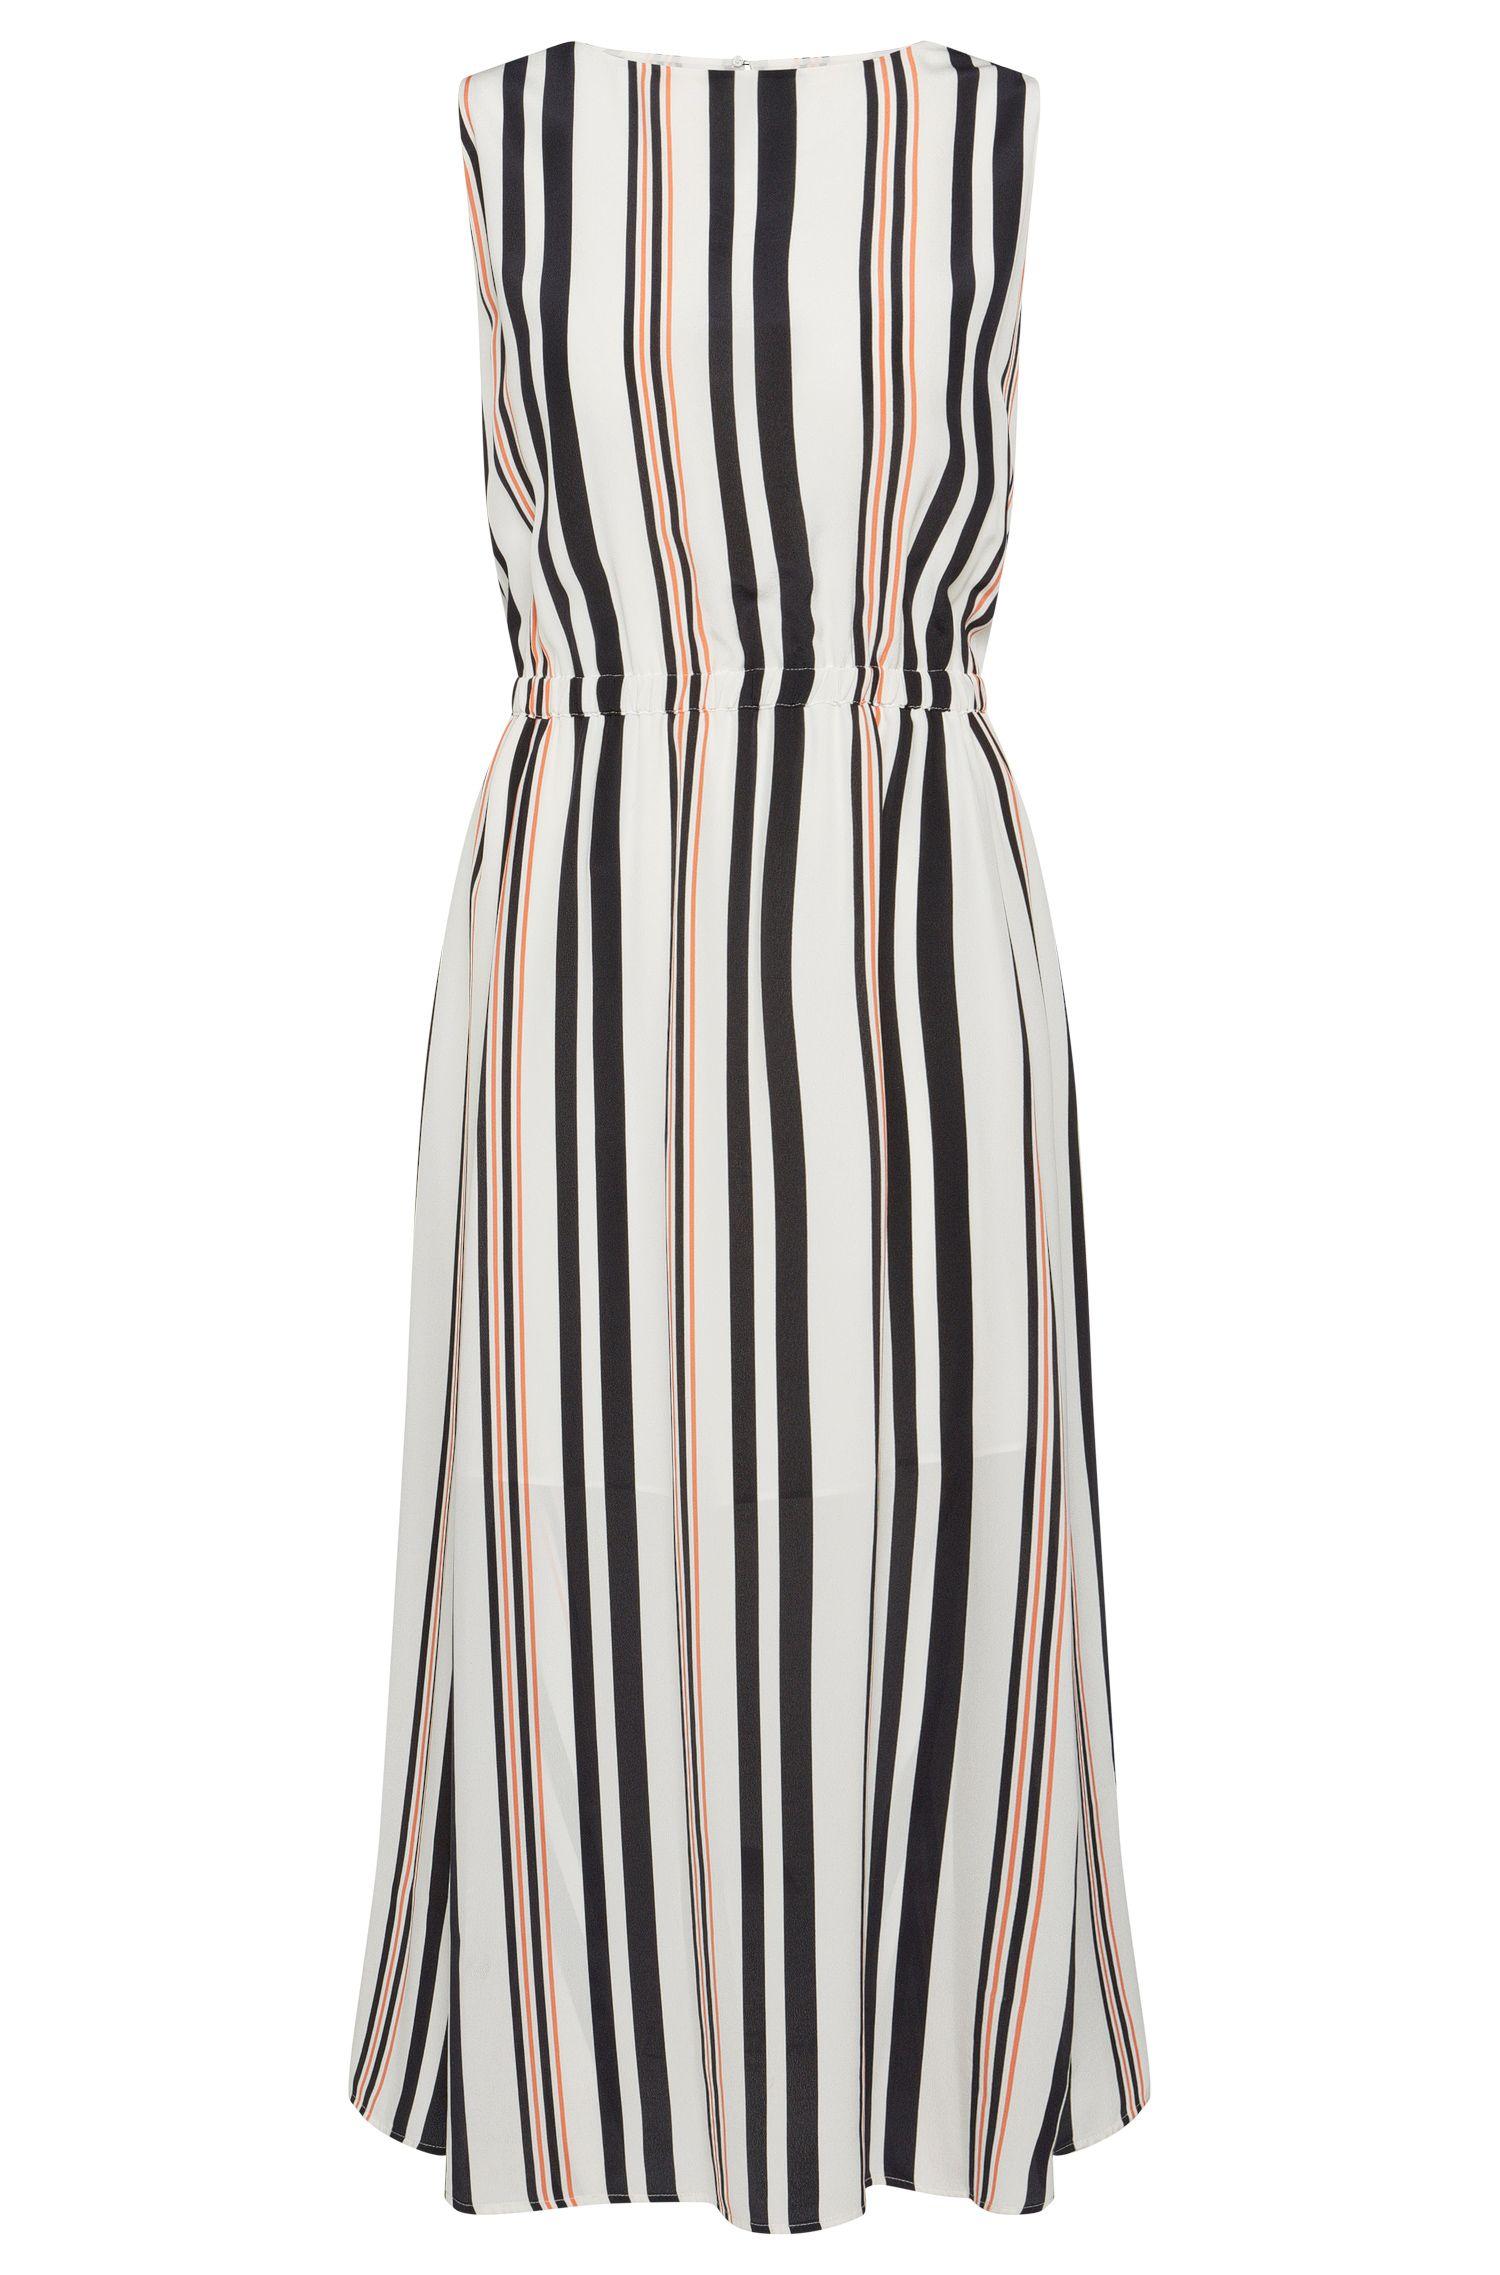 'Hemsy' | Silk A-Line Striped Dress